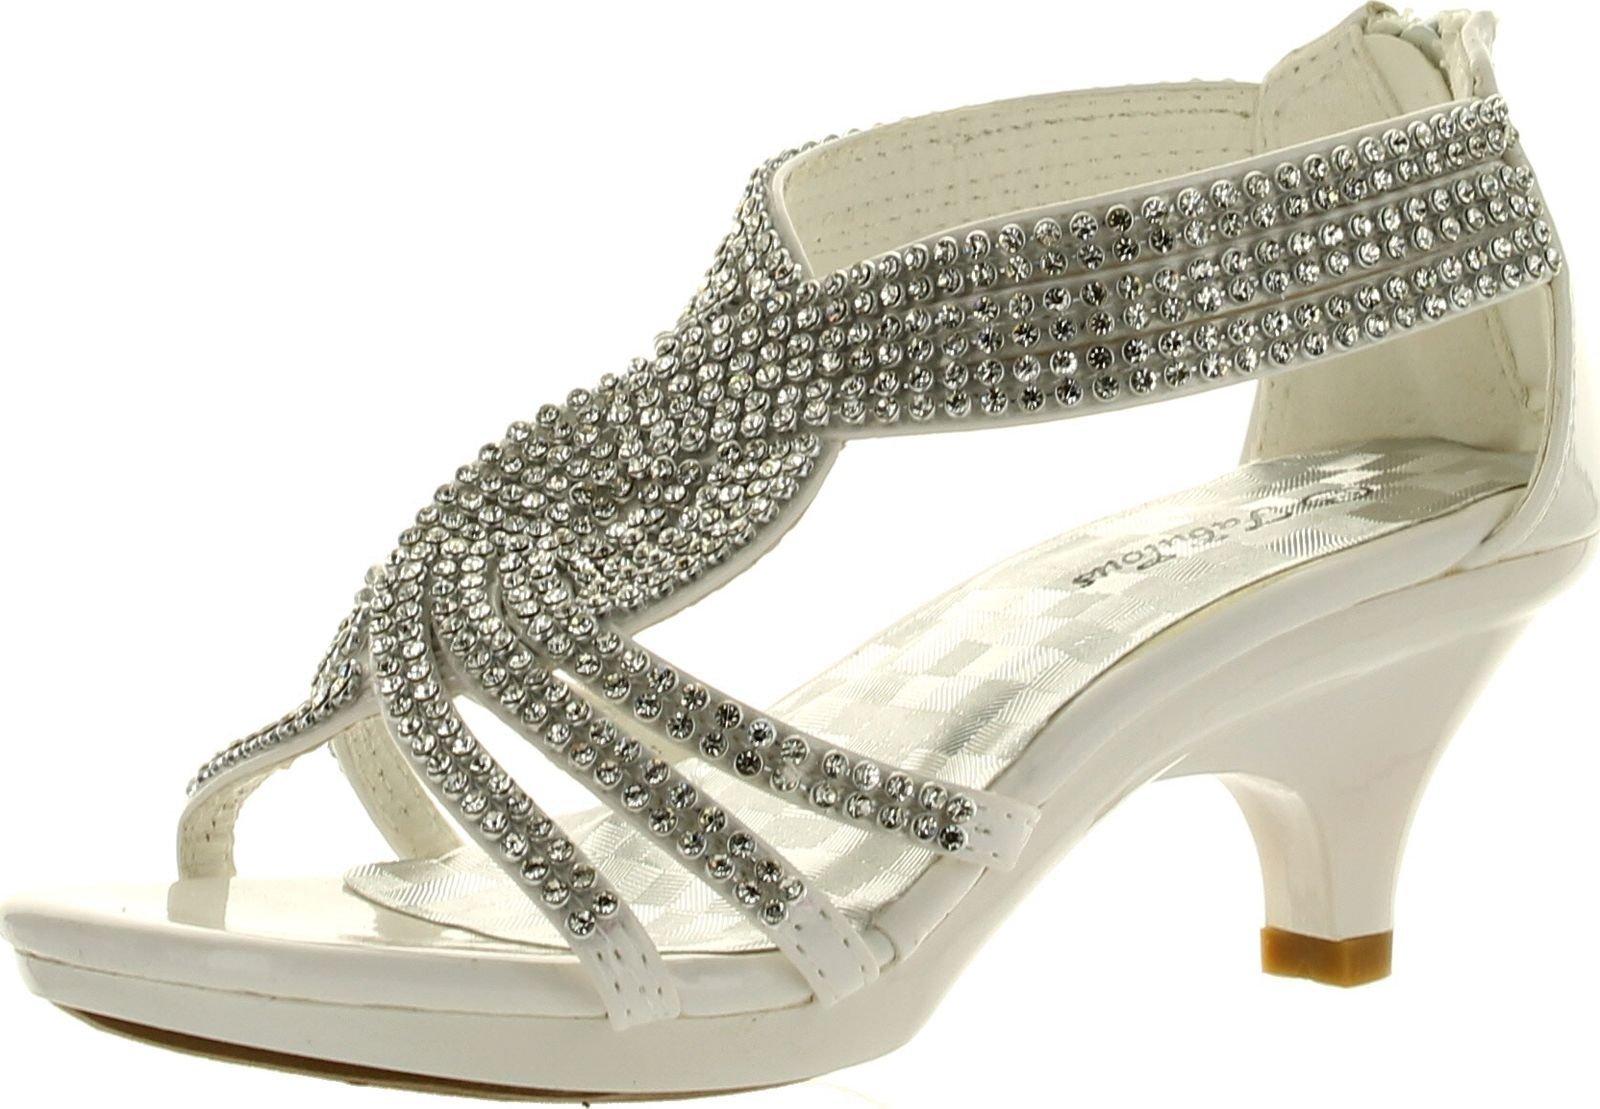 JJF Shoes Angel-37 Kids White Little Girls Bling Rhinestone Platform Dress Heels Sandals-4